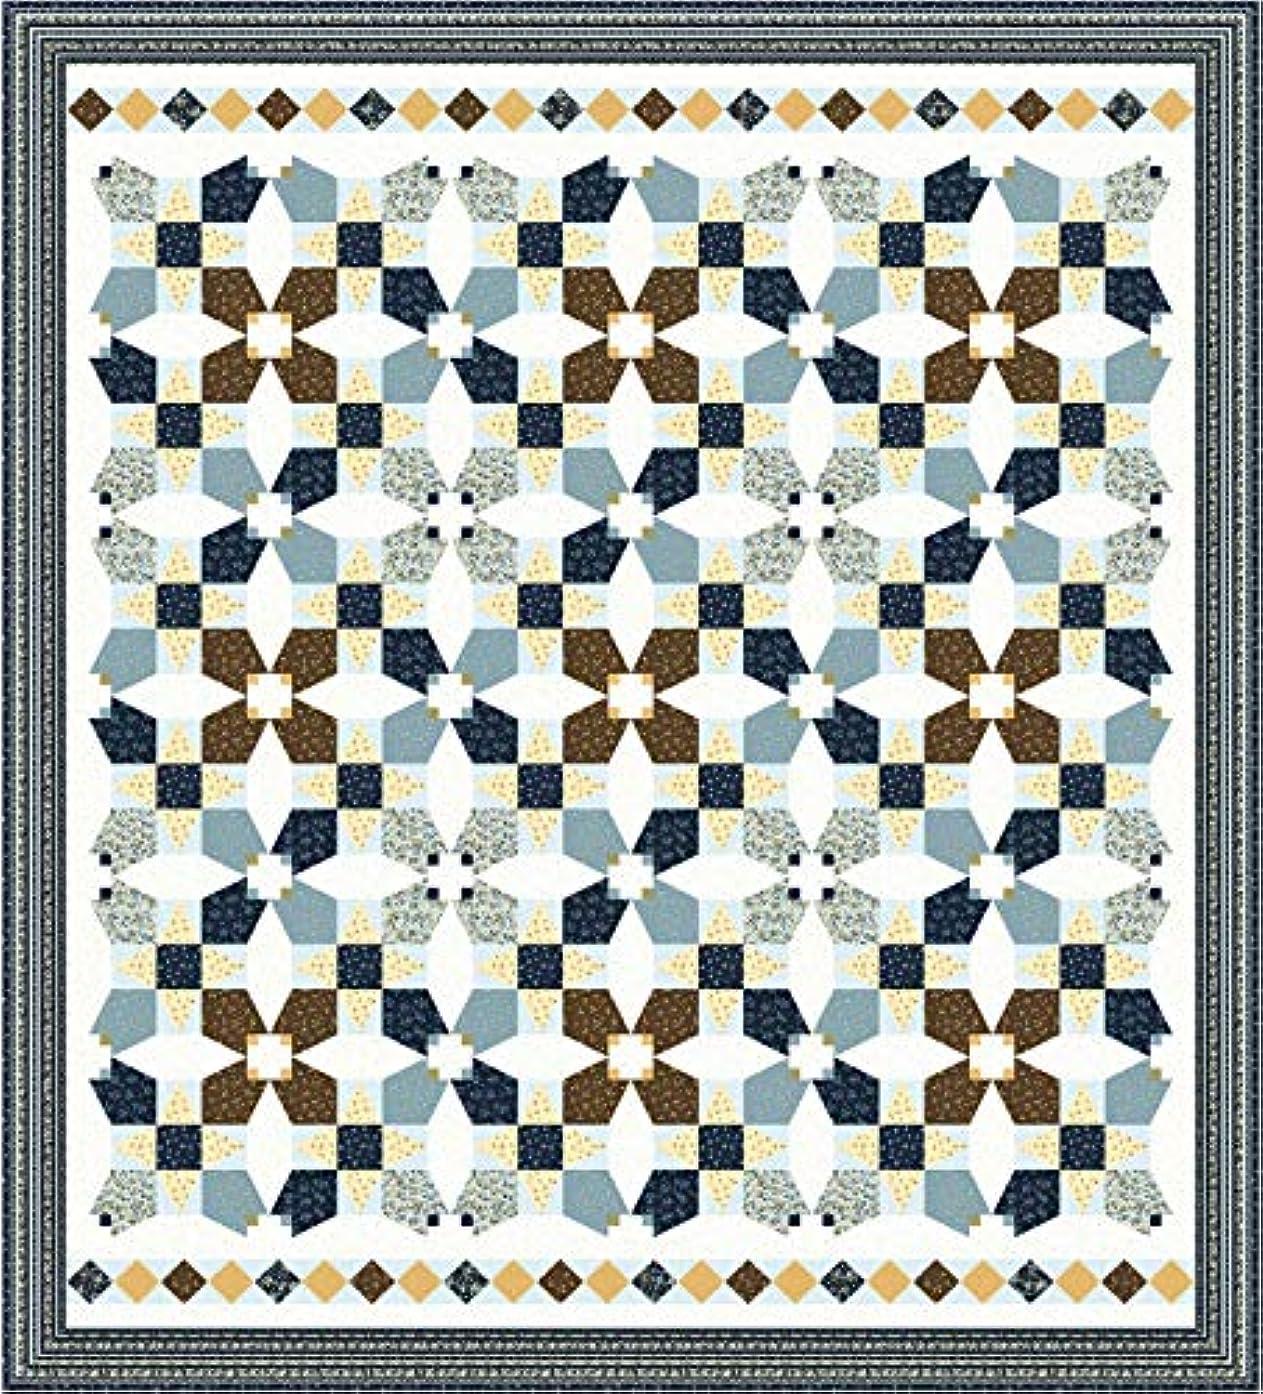 English Countryside Duchess' Blooms Quilt Kit Maywood Studio